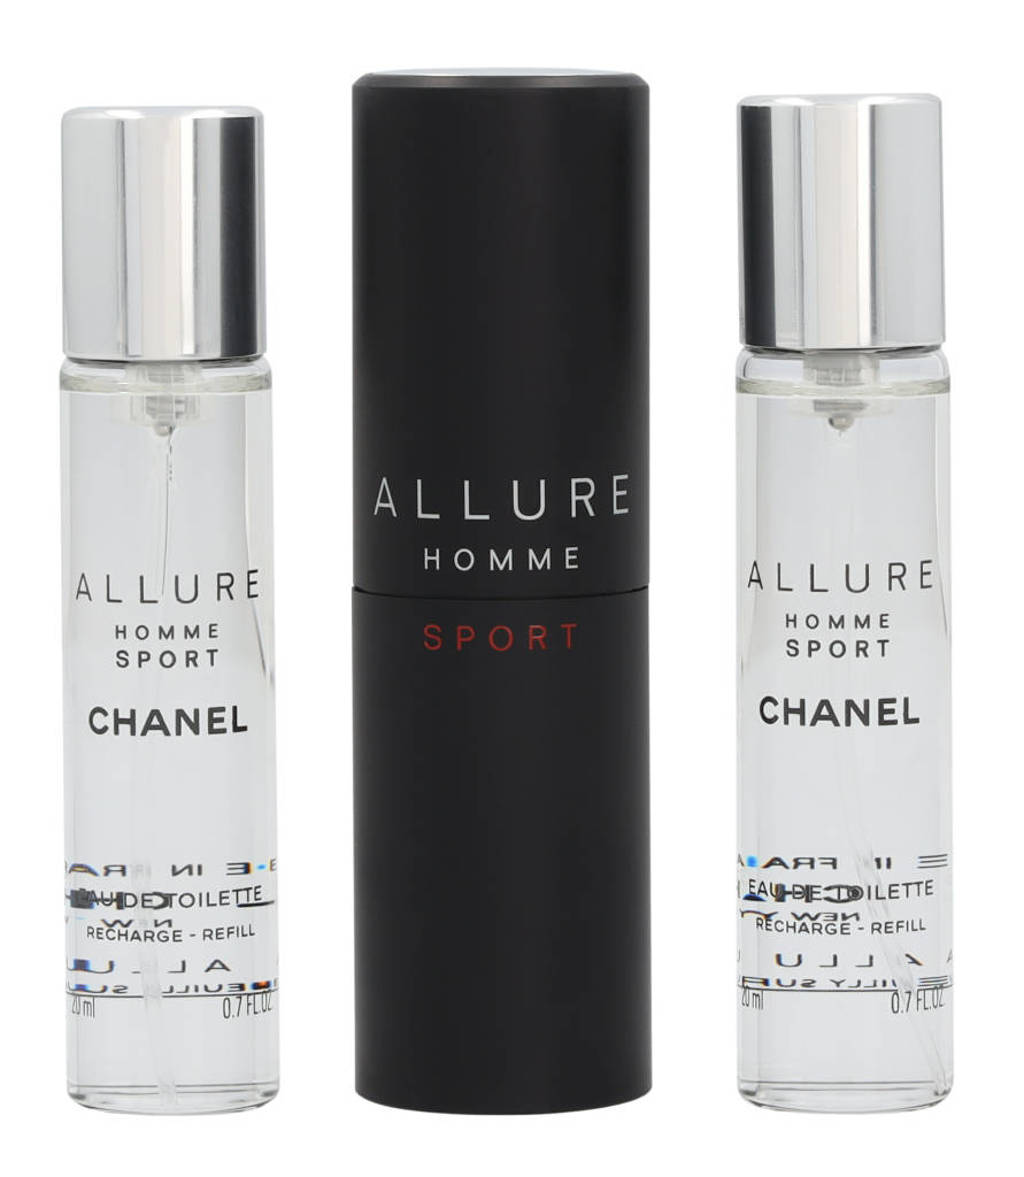 Chanel Allure Homme Sport geschenkset